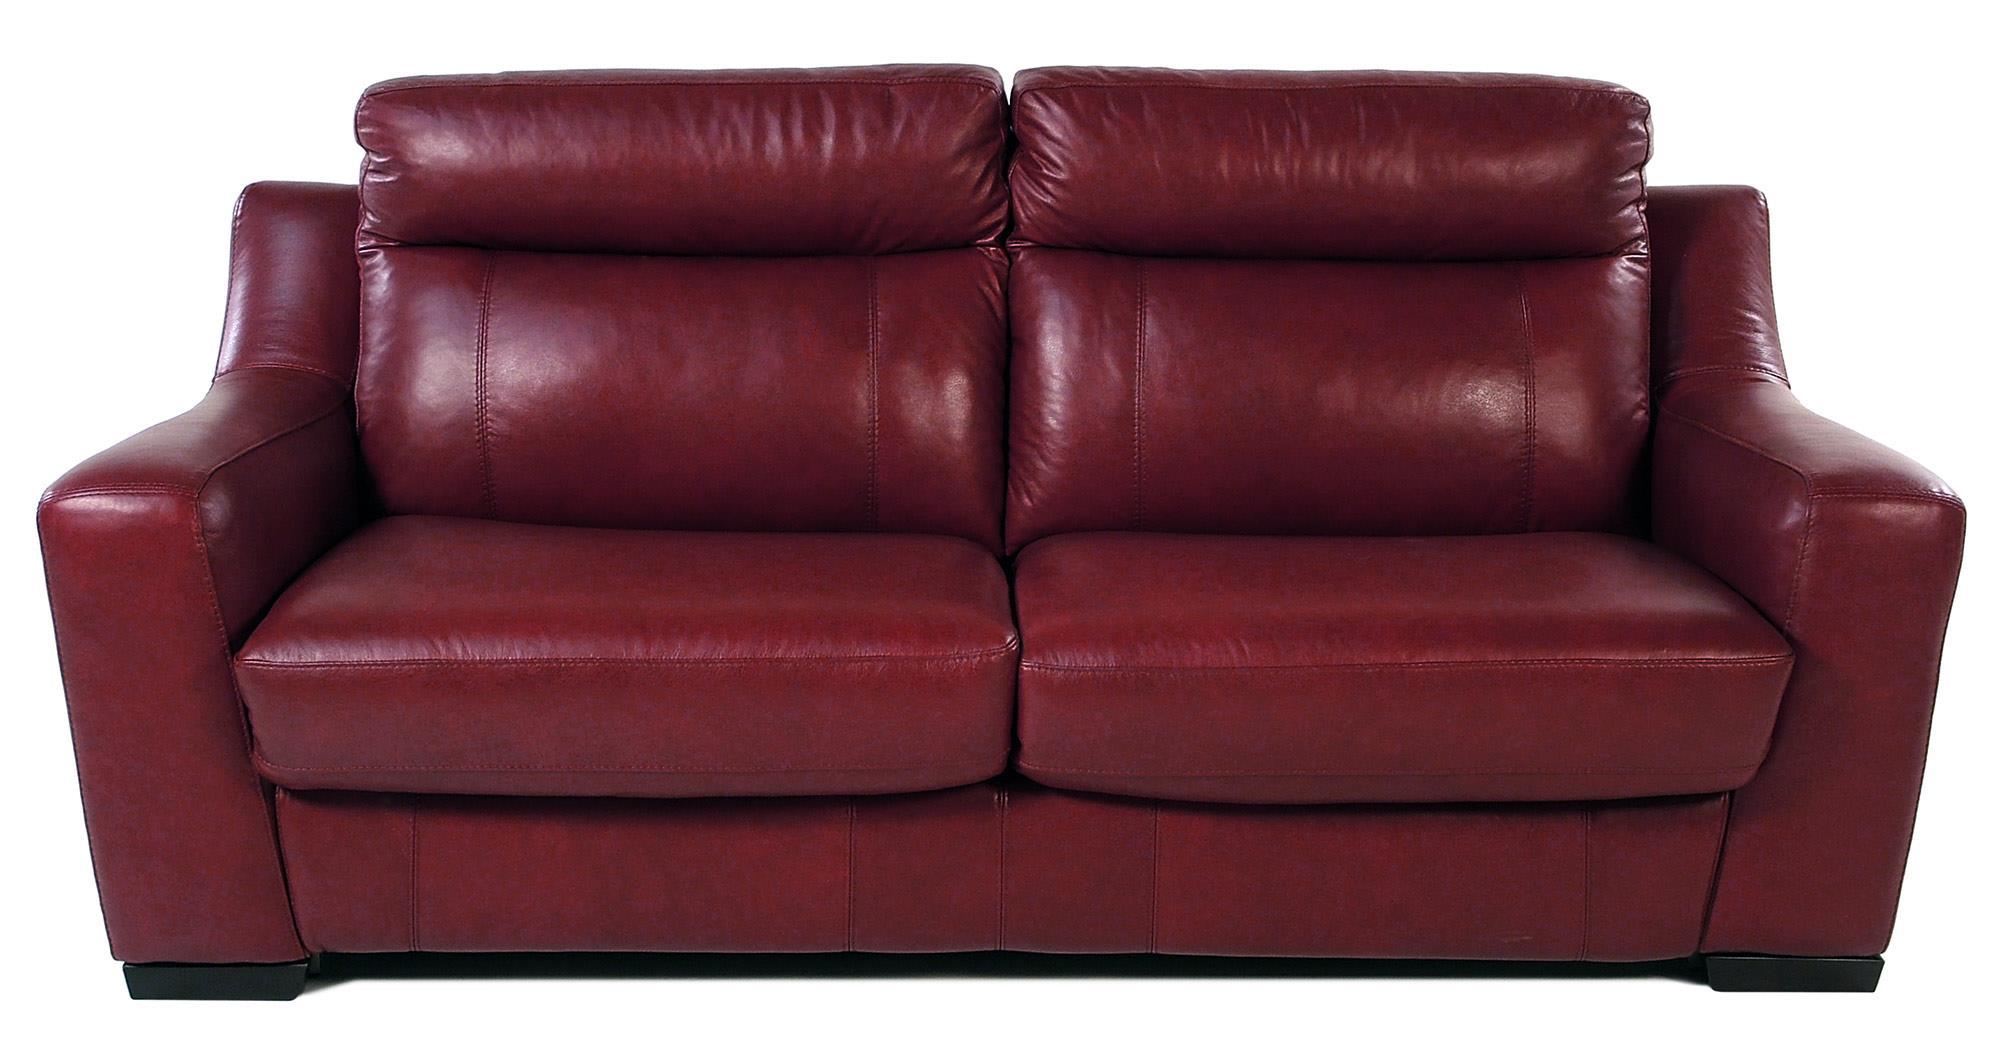 Delicieux Giovani BartoliniFull Size Leather Sleep Sofa ...